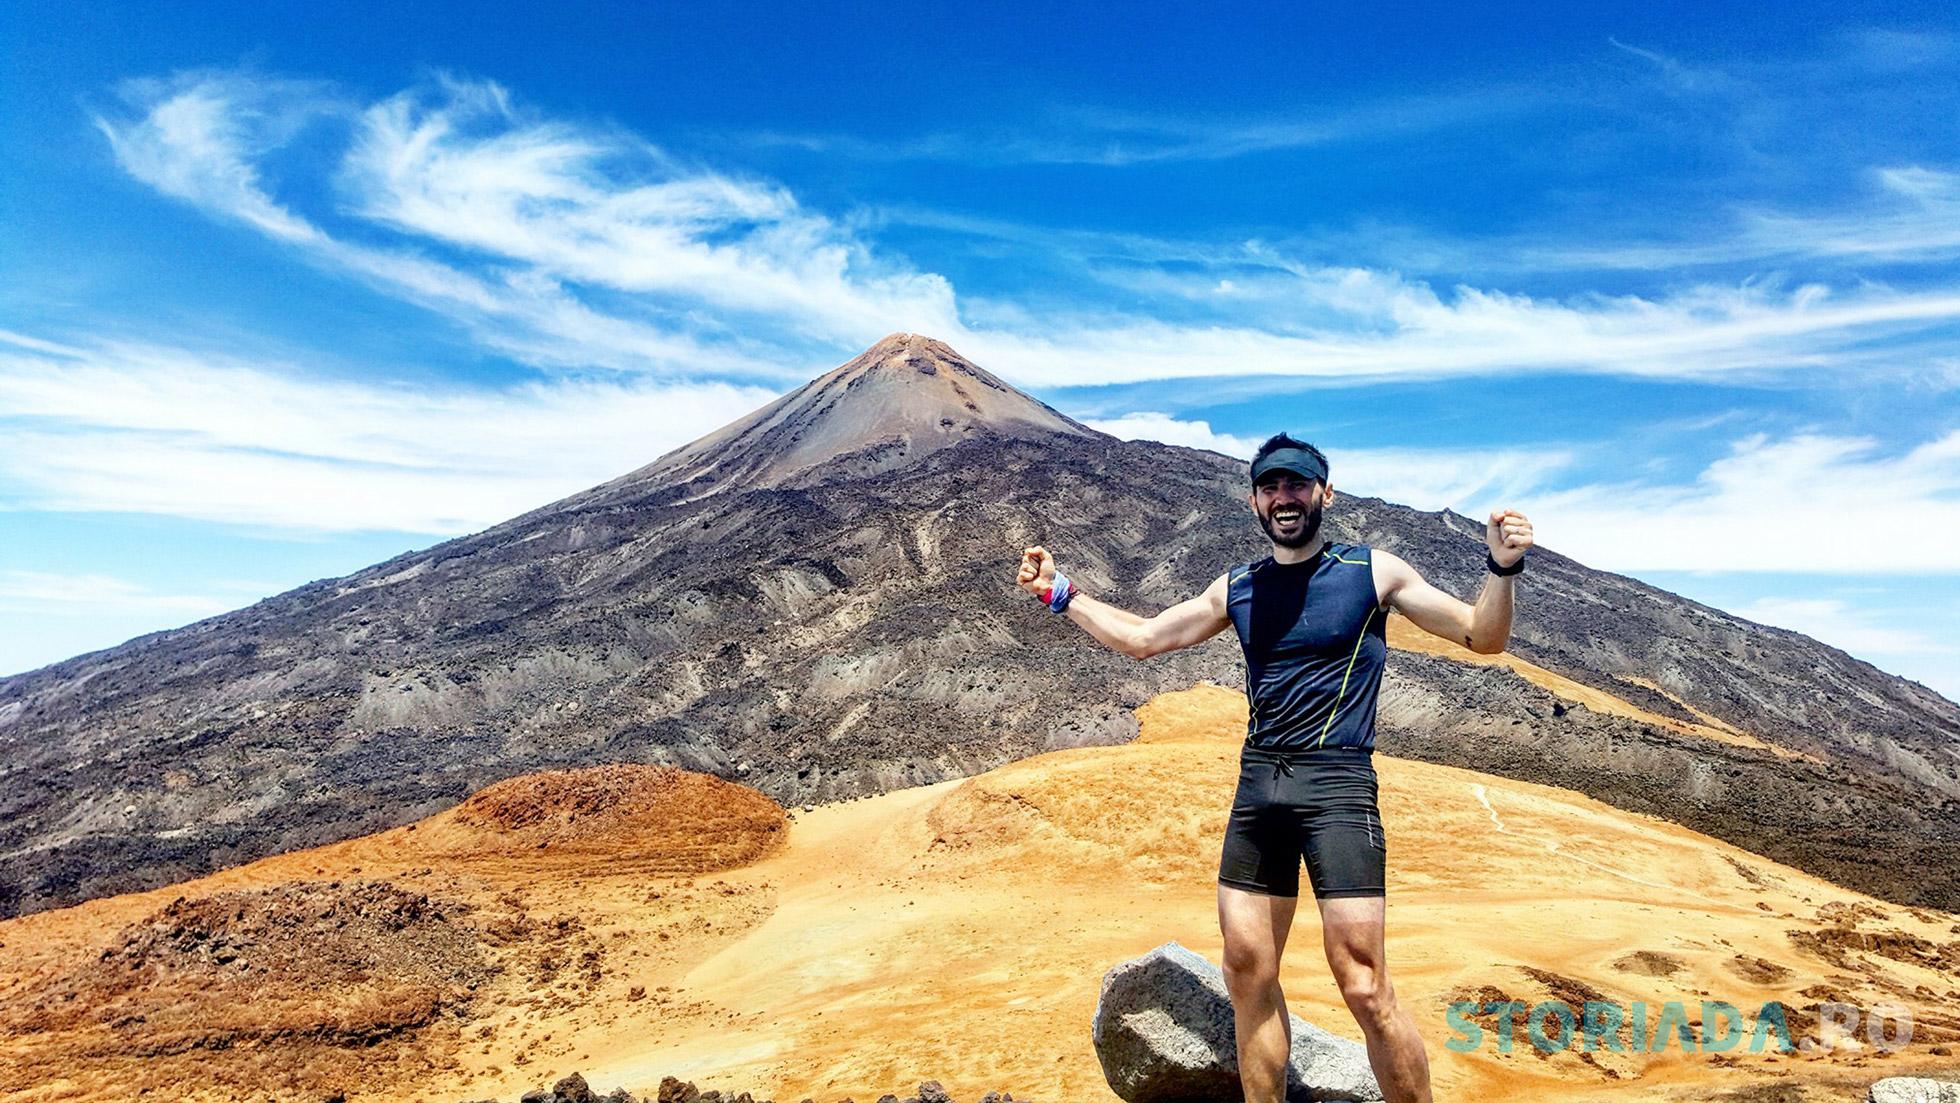 Alergare pe El Teide, Tenerife